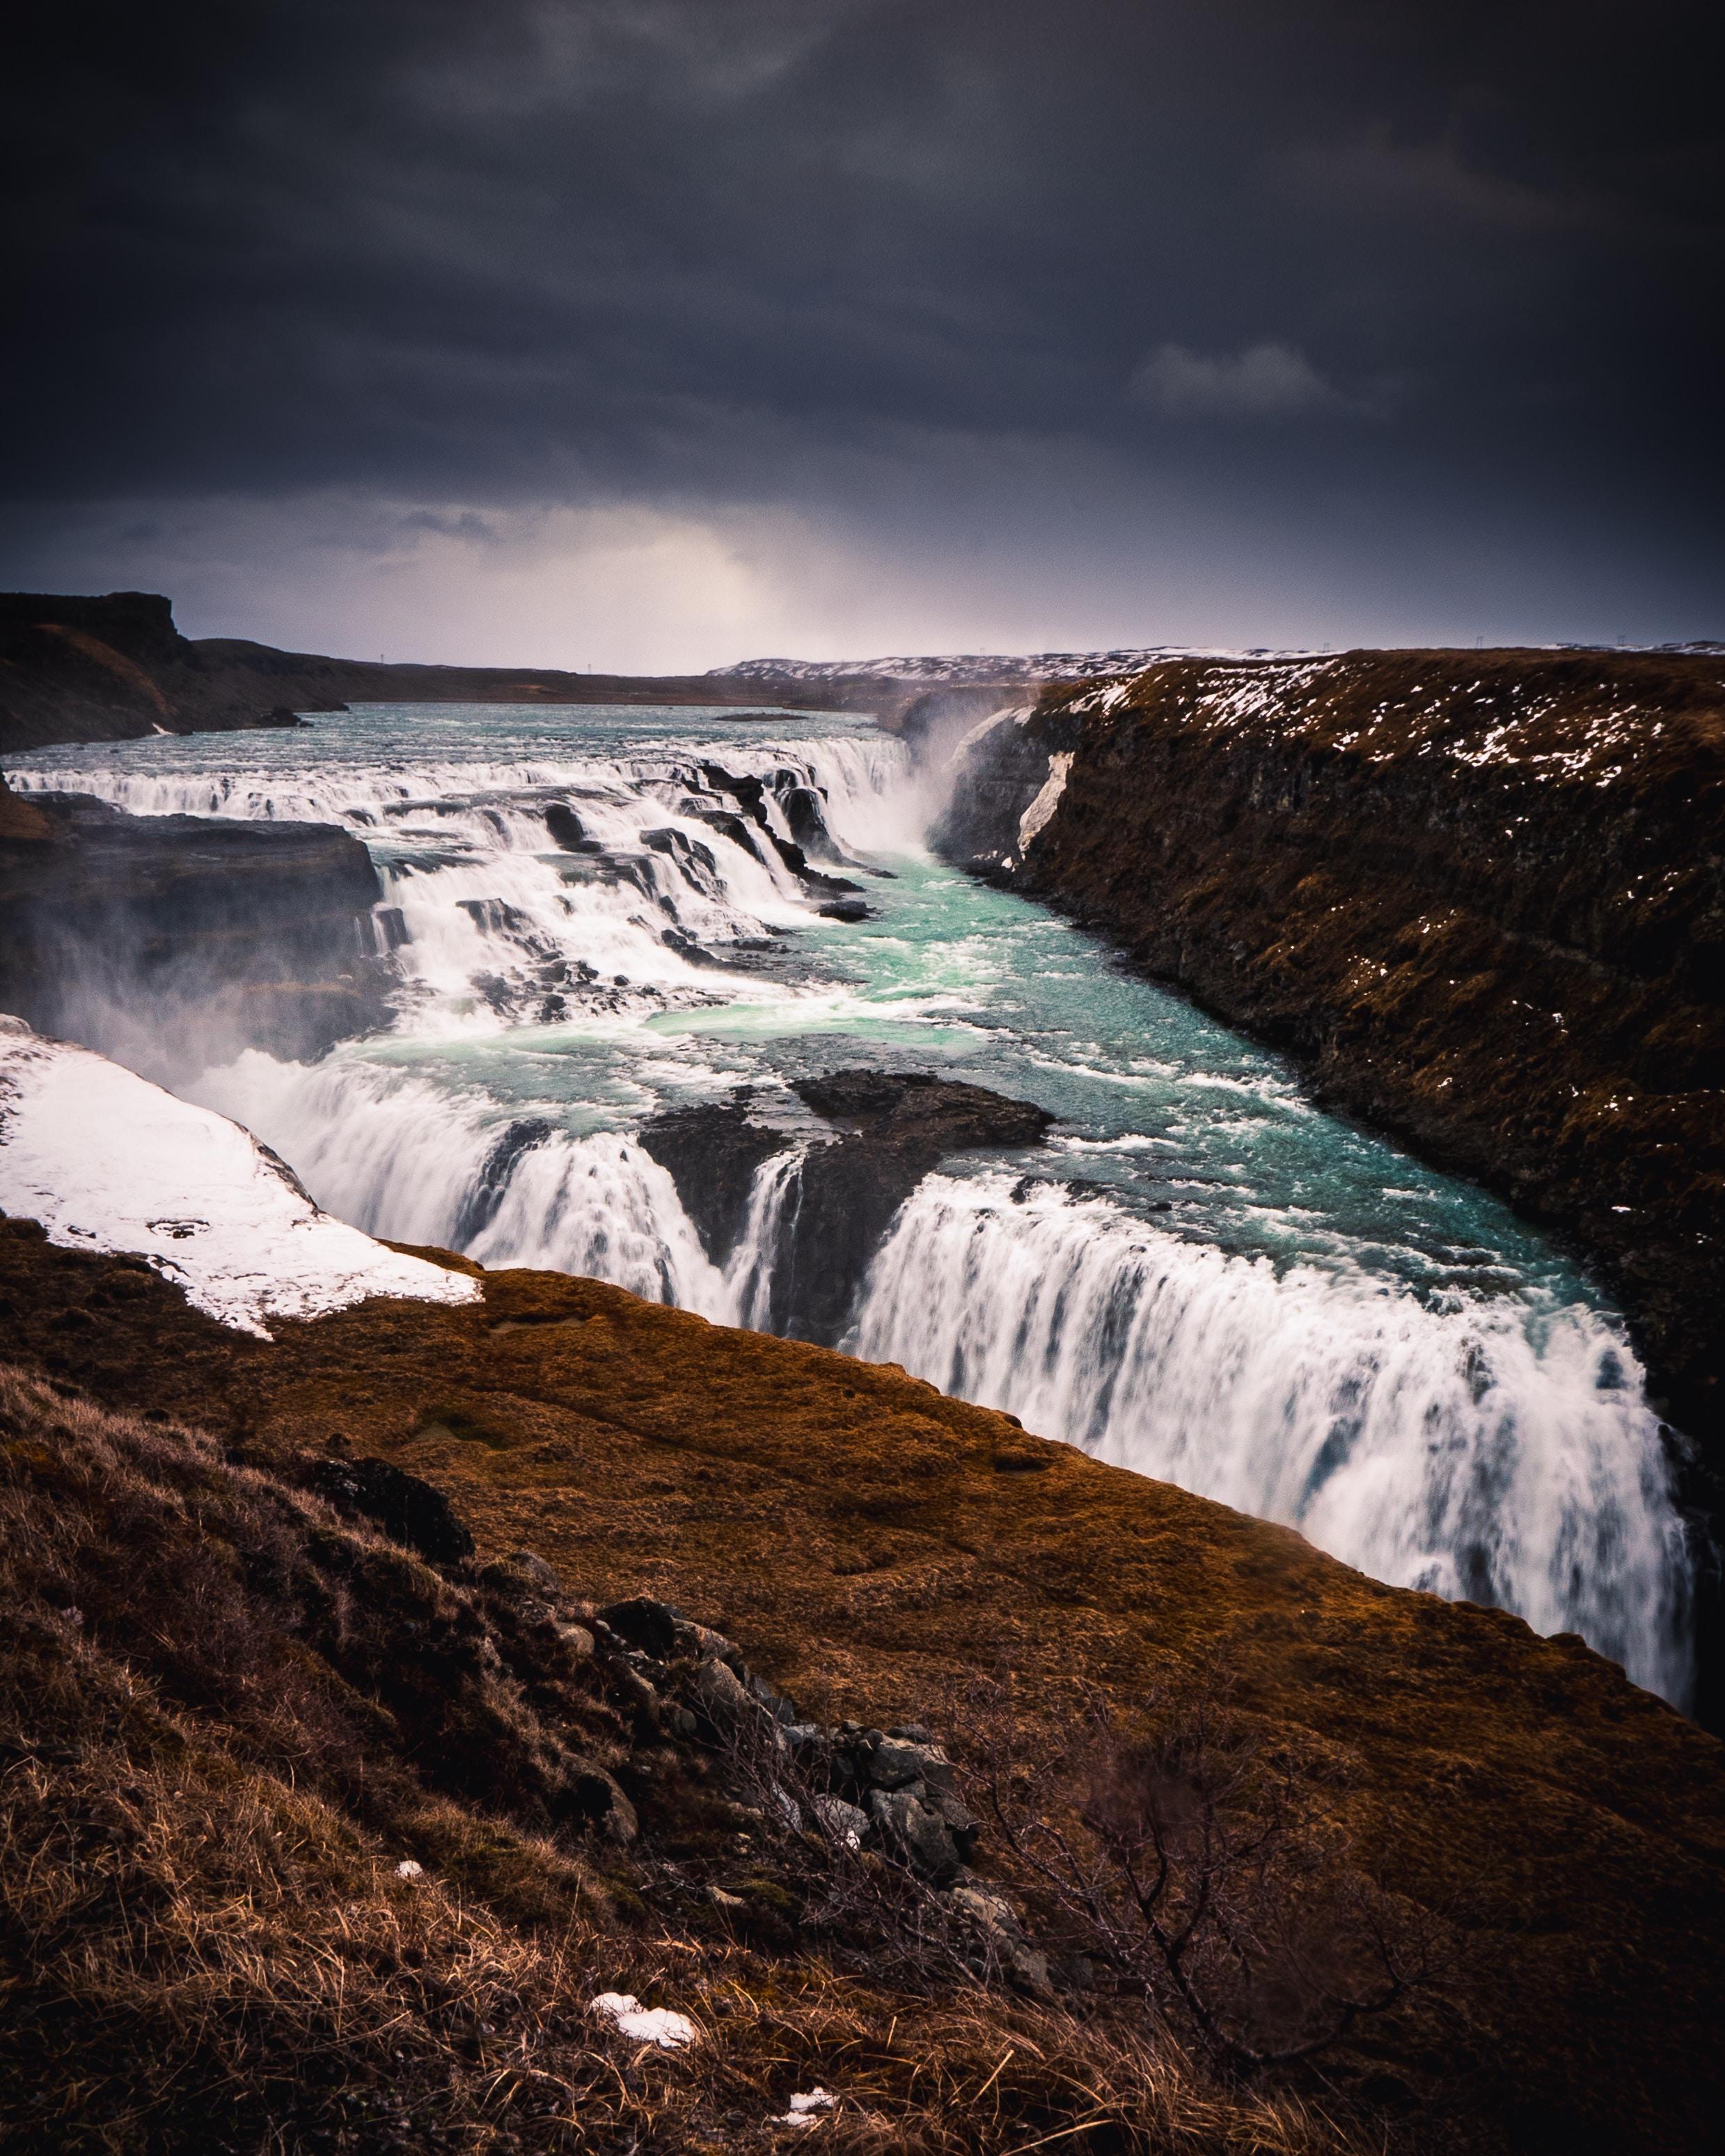 waterfalls under grey sky at daytime